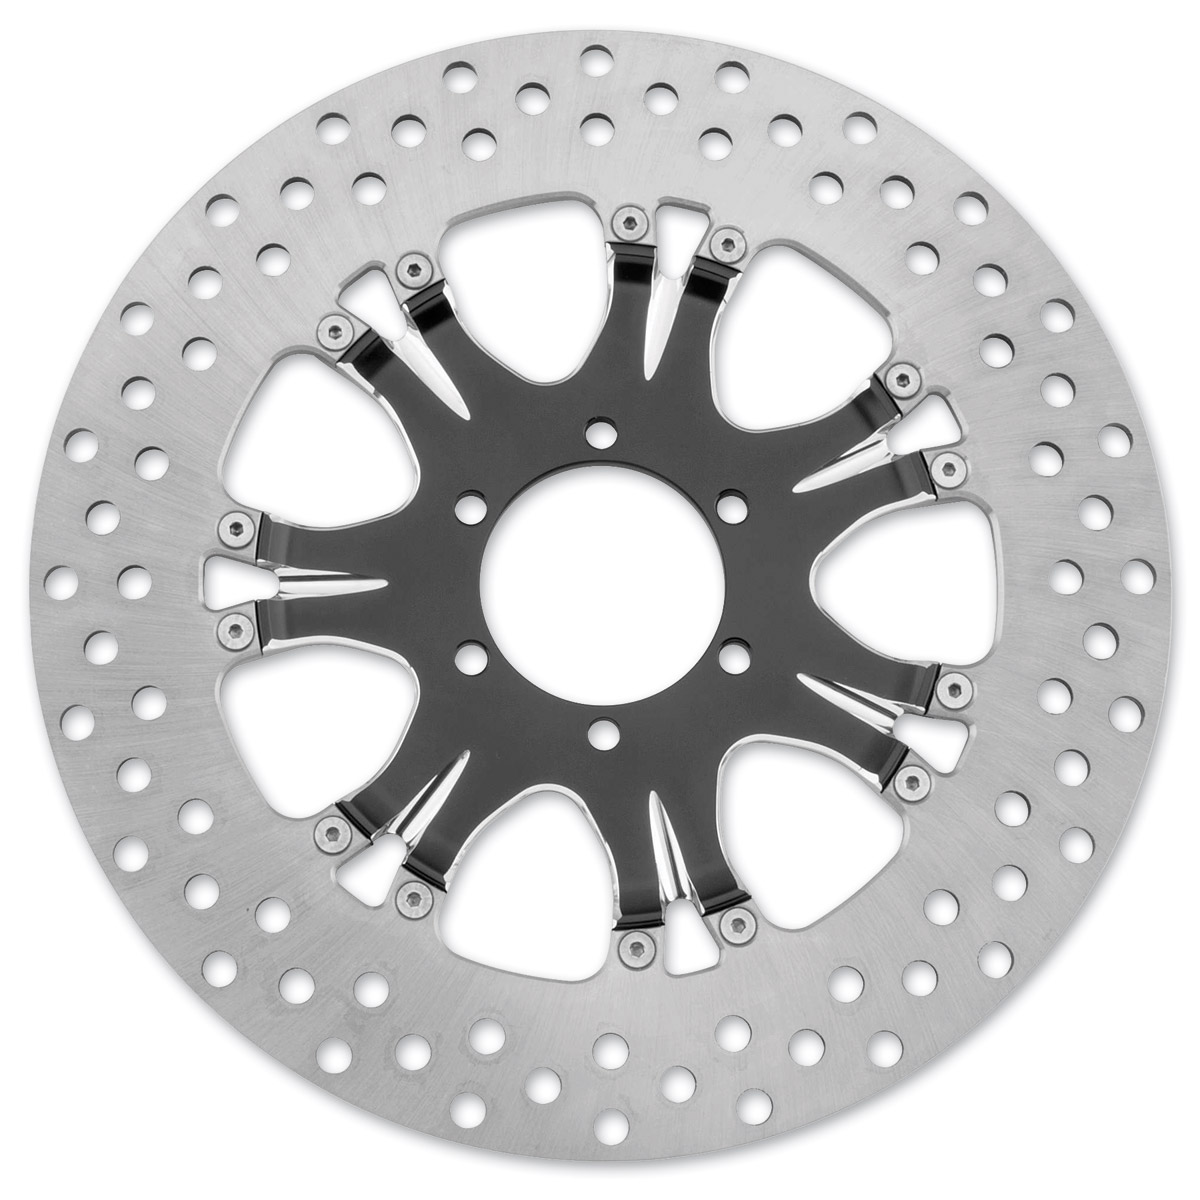 Performance Machine 11.8″ Heathen Contrast Cut Platinum Front/Rear Brake Rotor